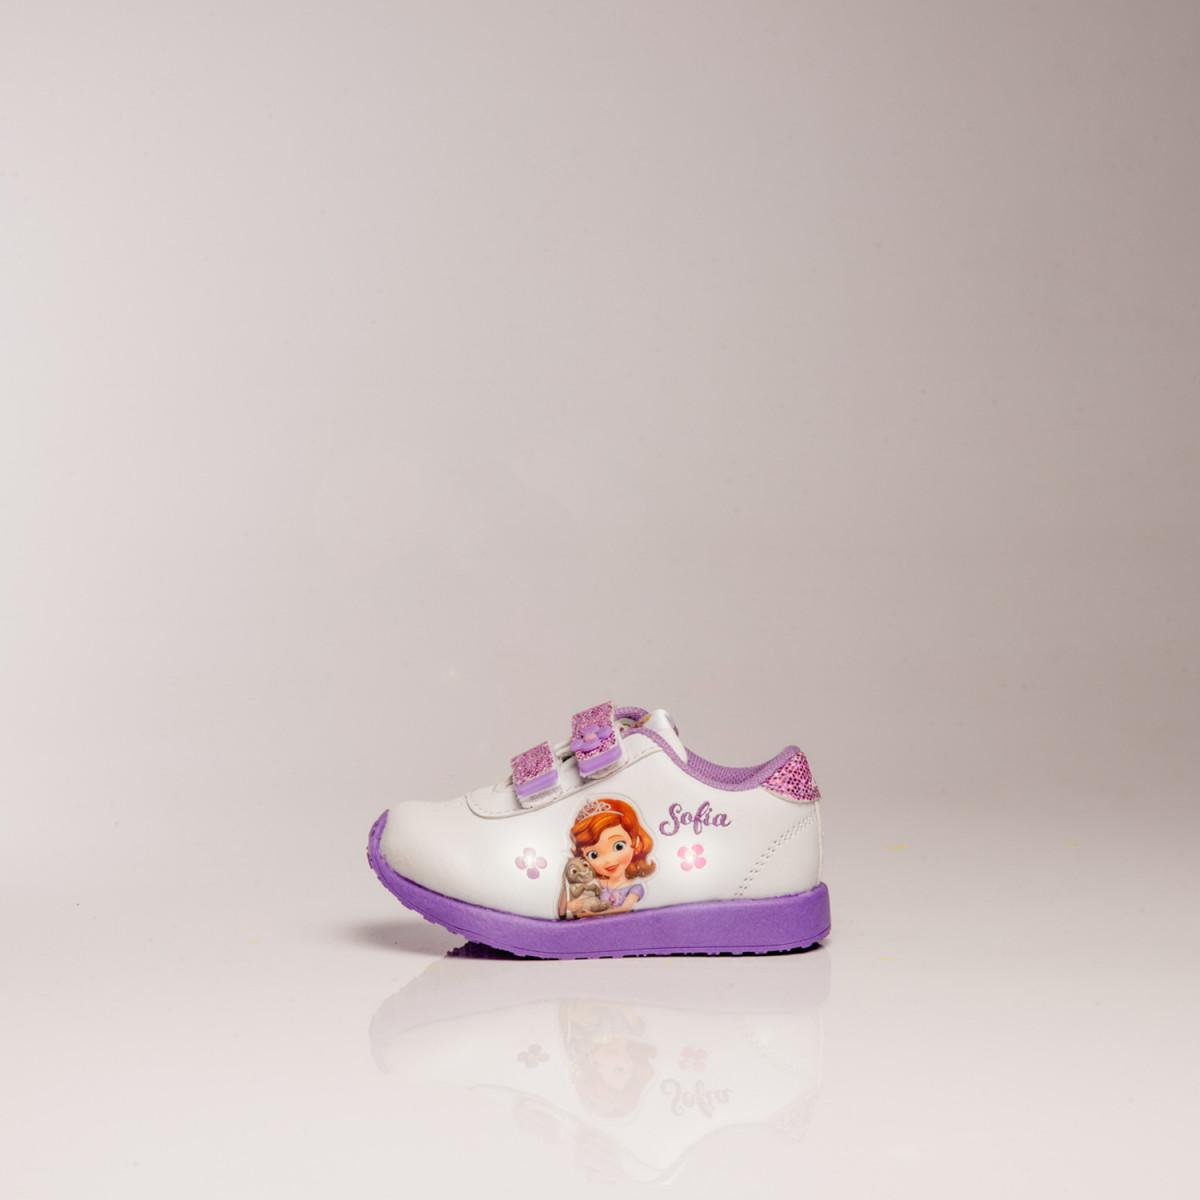 Zapatillas Disney Free Moda Sofia